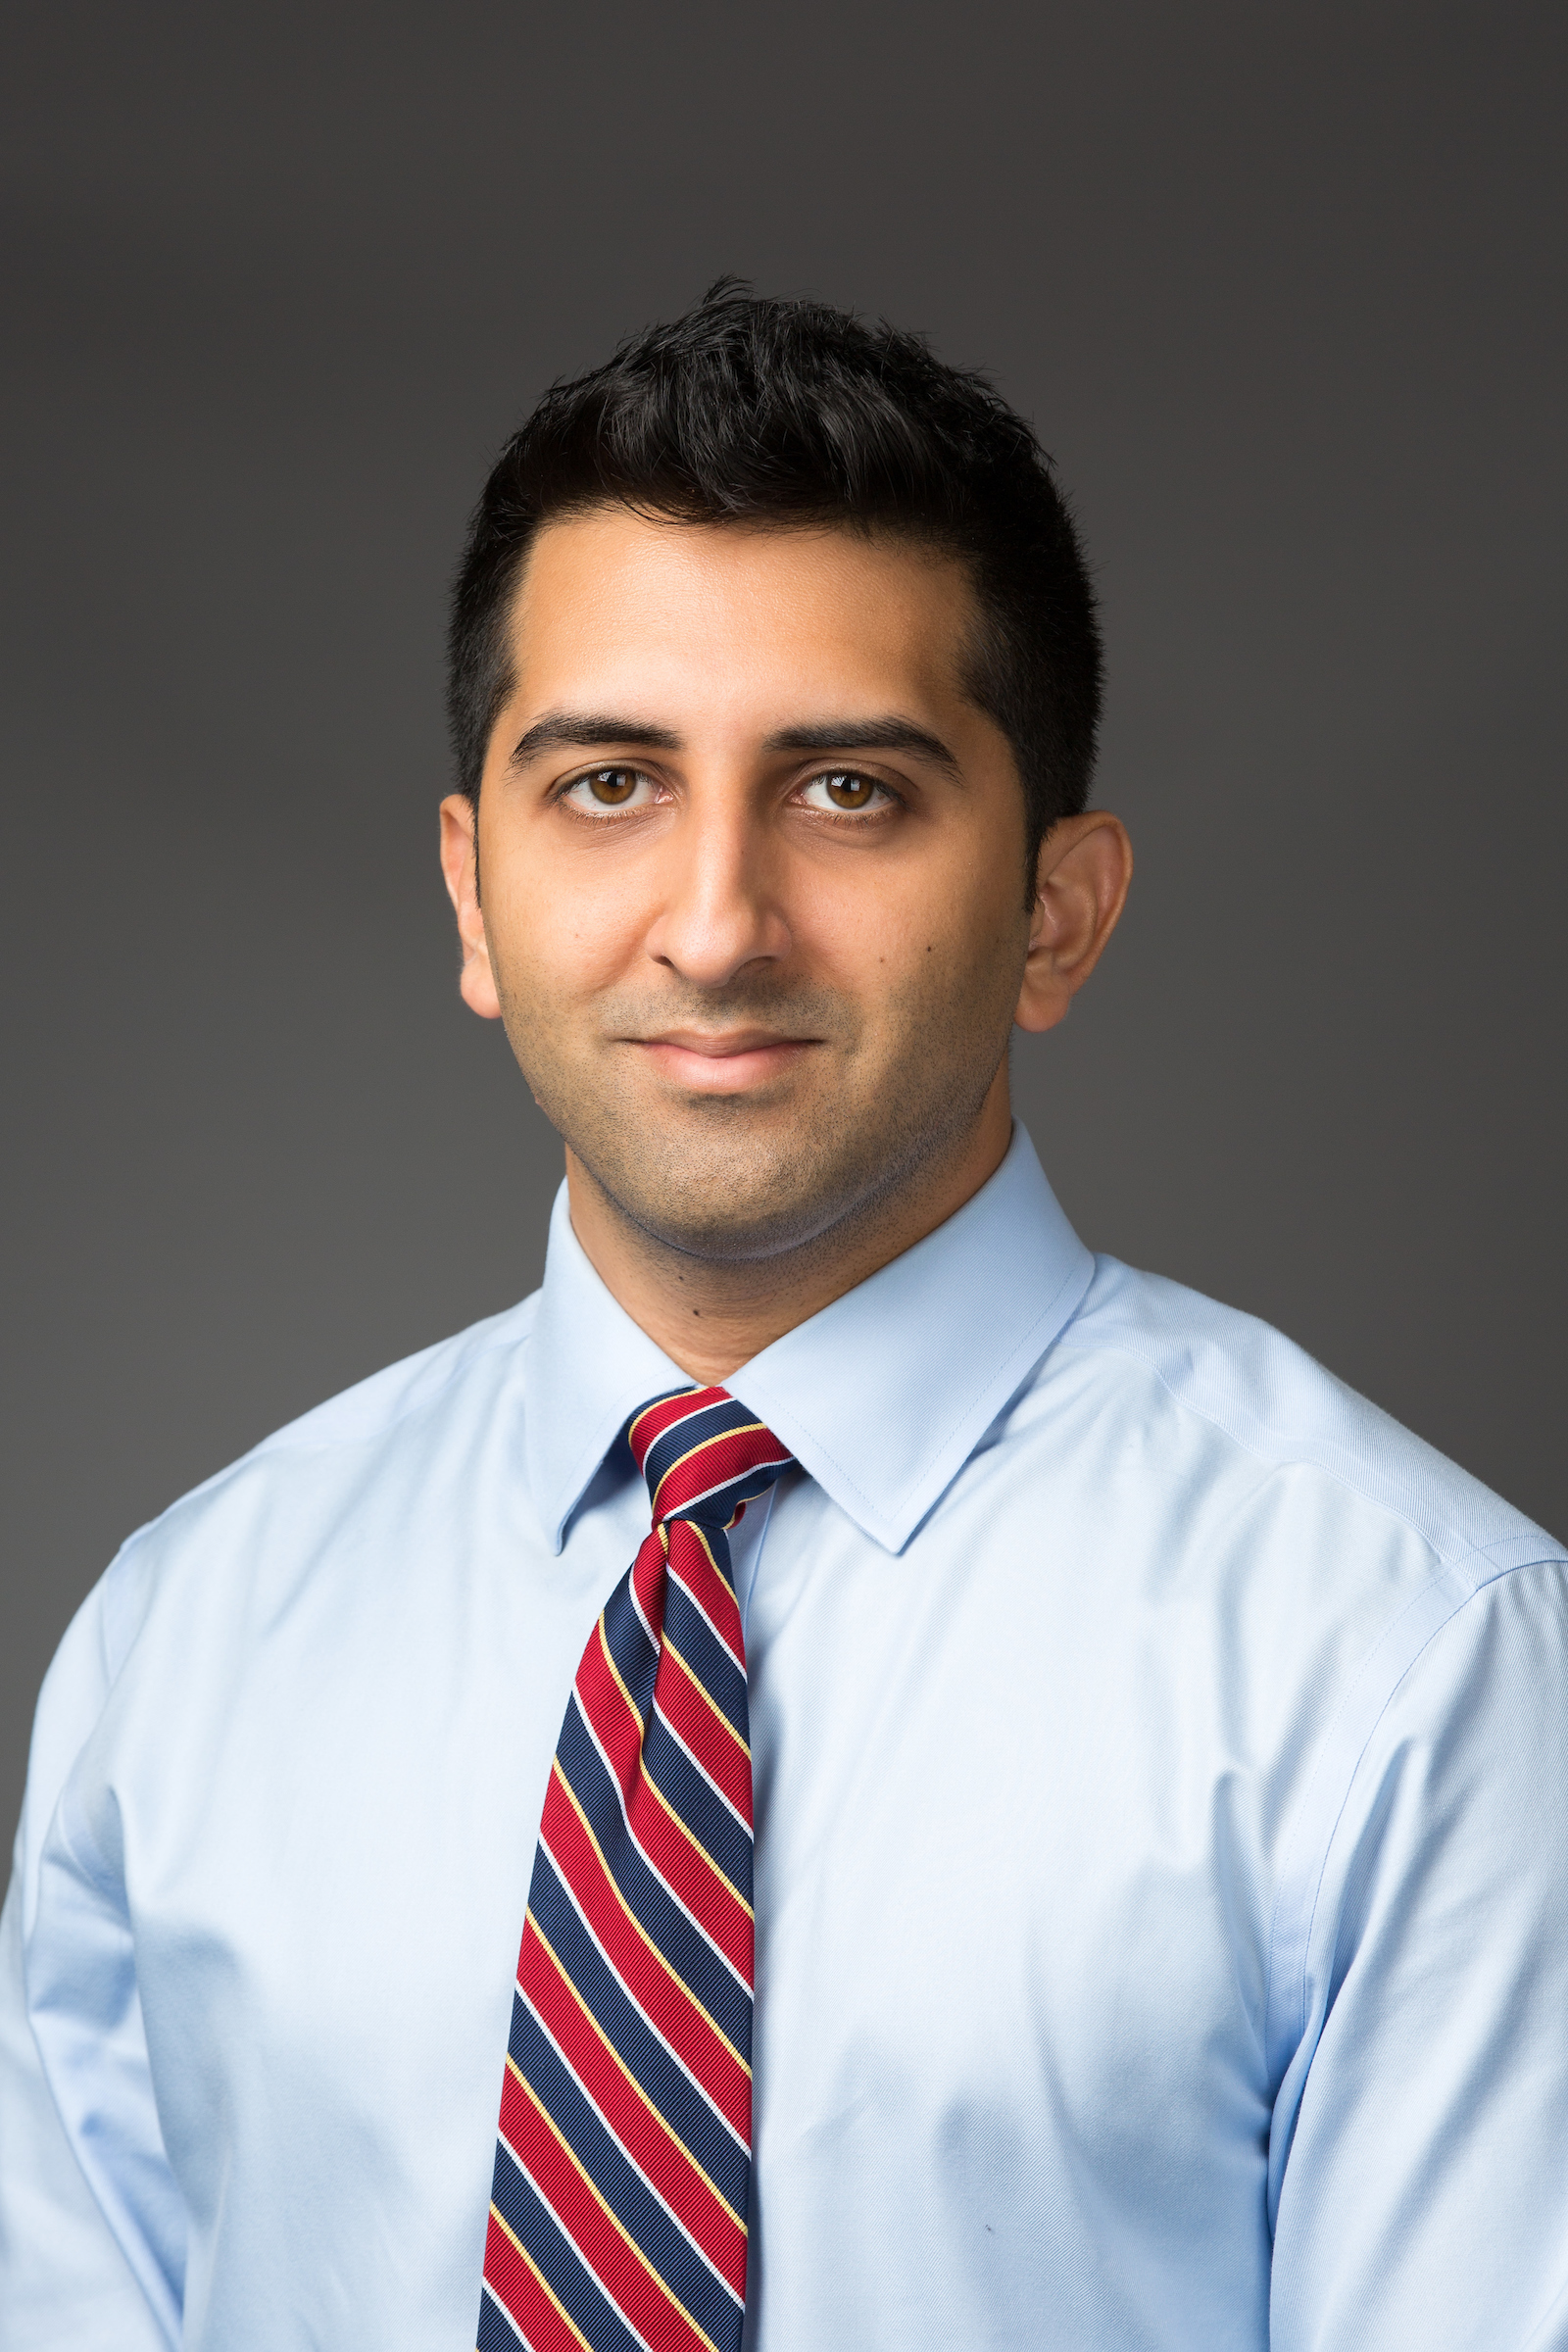 Shivam Kharod Physician Resident Radiation Oncology University of Florida